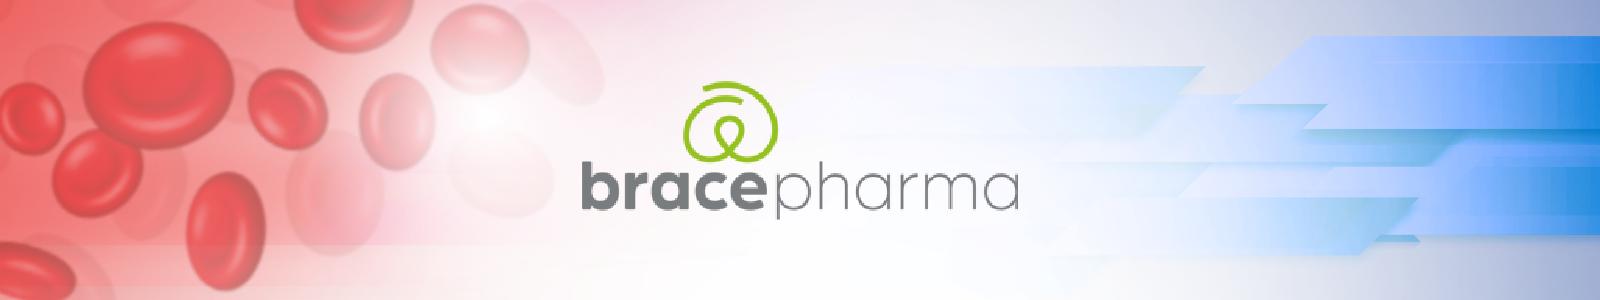 Diacordis2021-BANNER-bracepharma